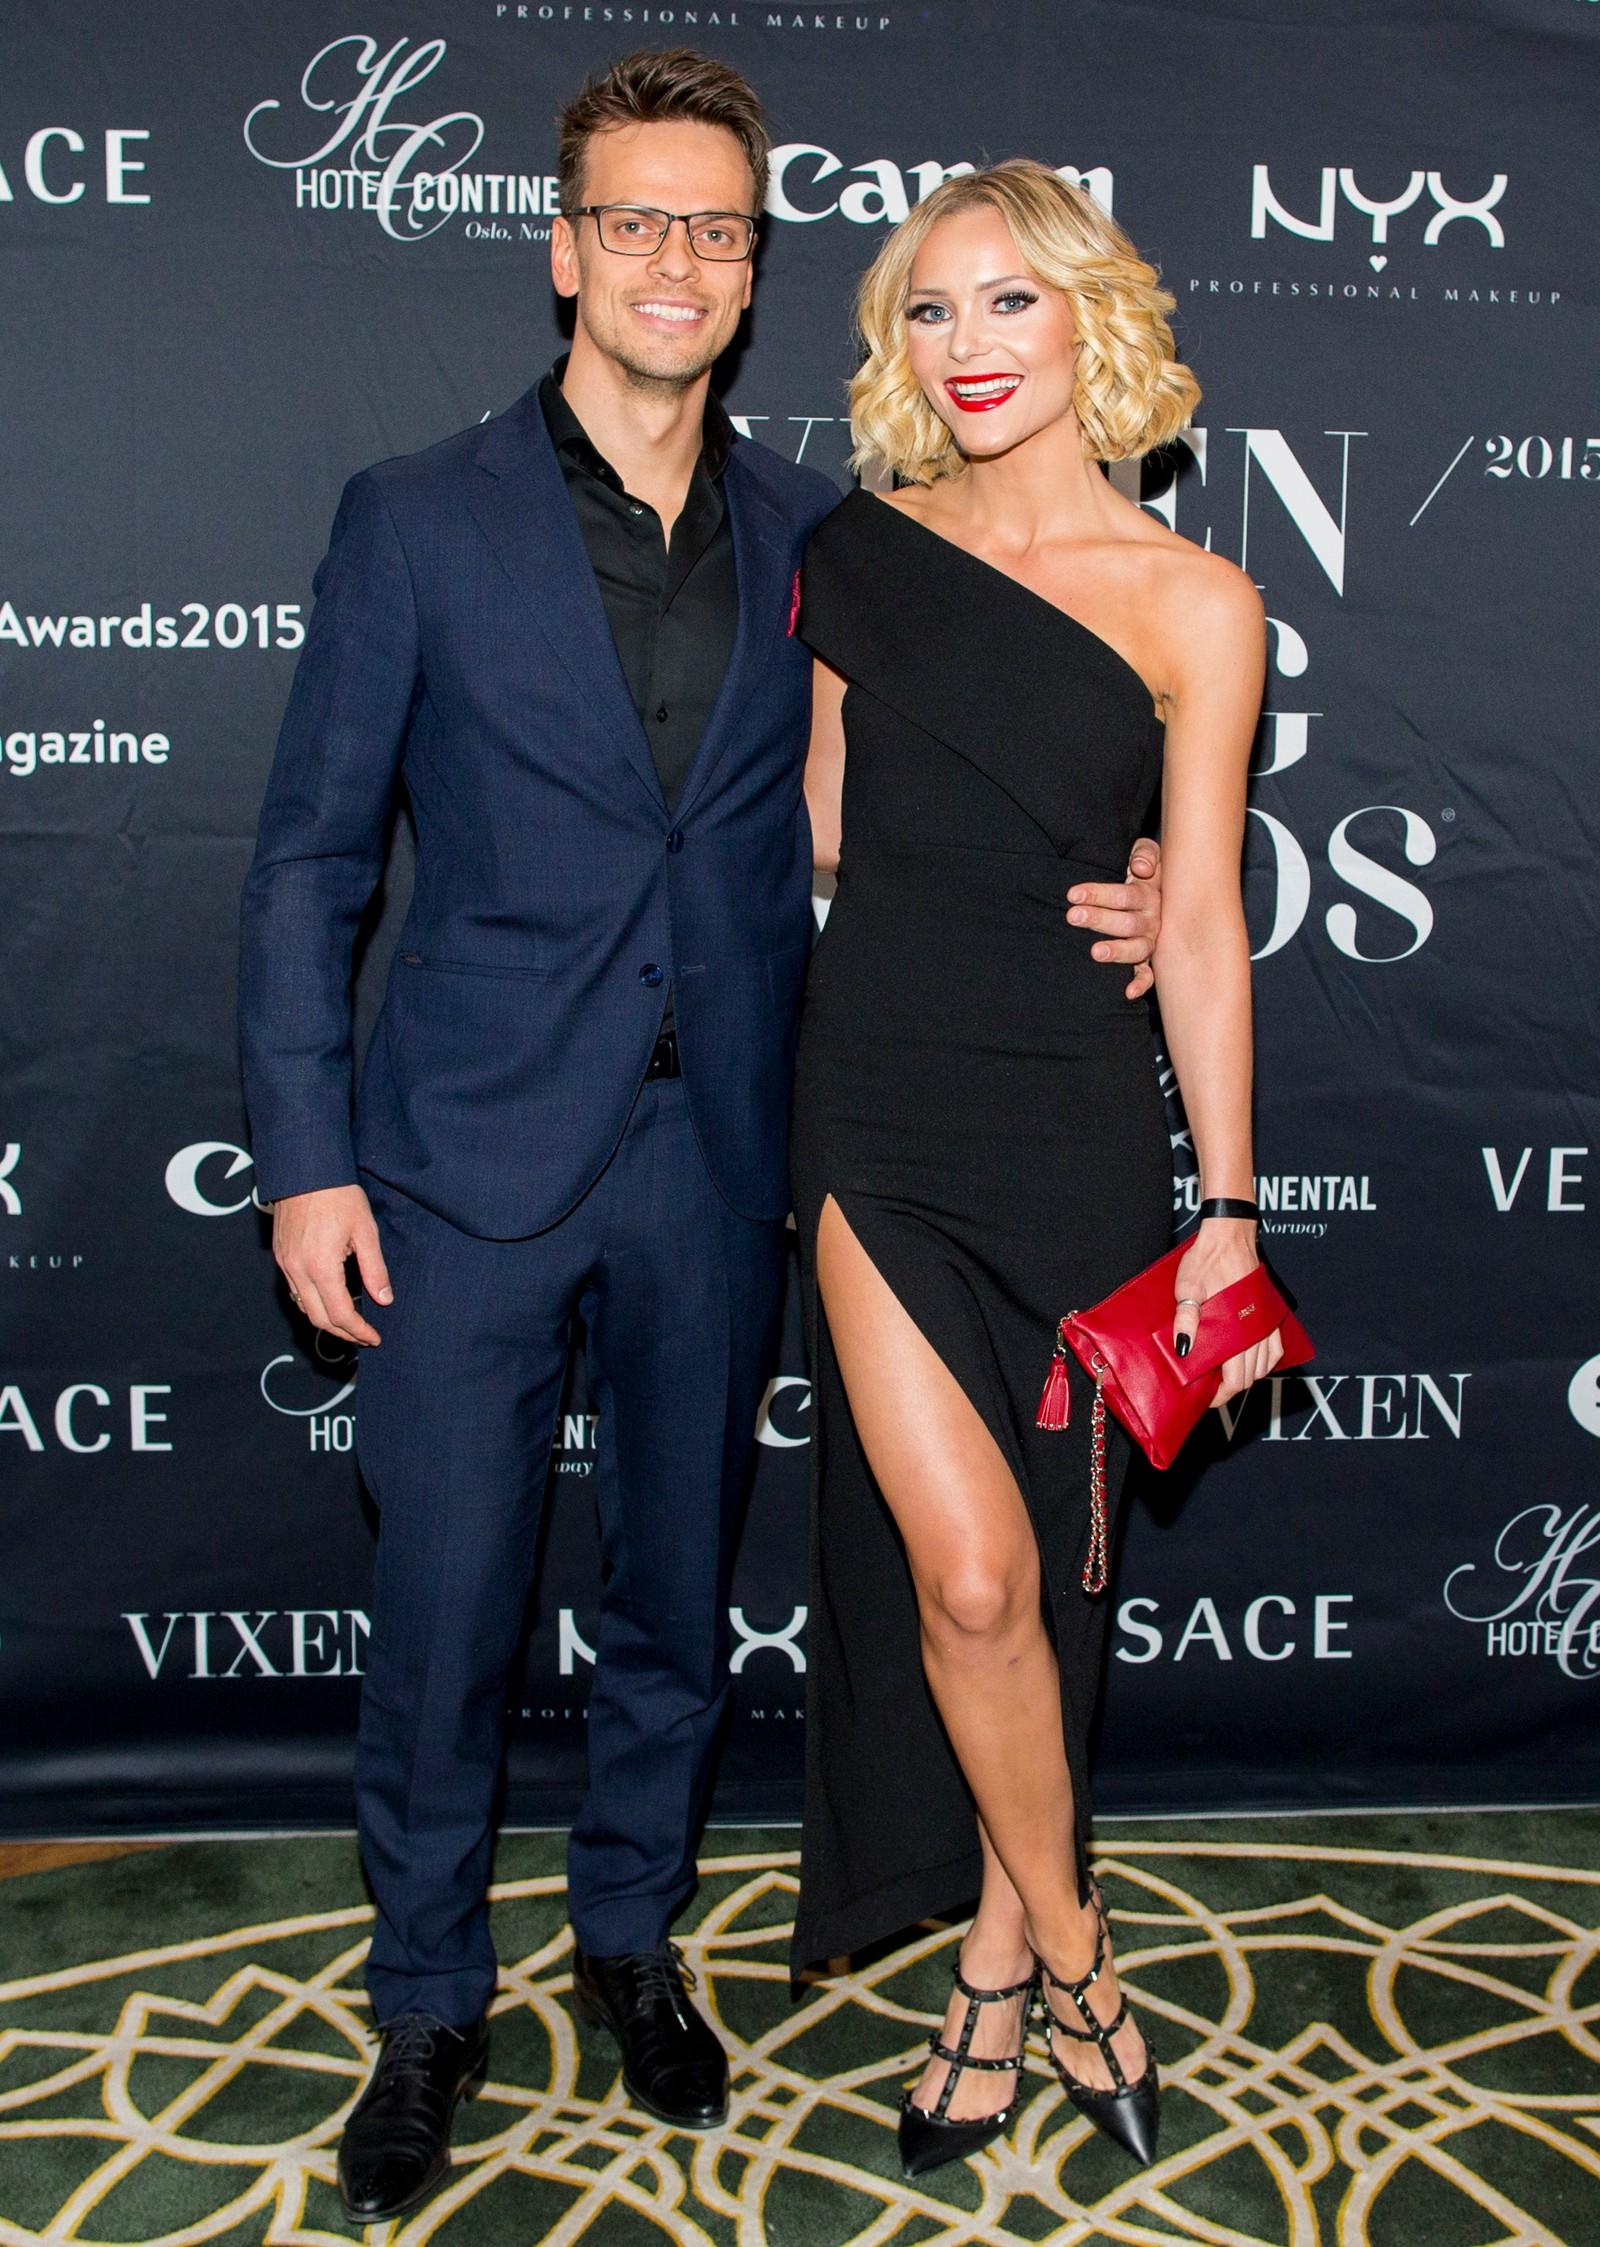 Caroline Berg Eriksen (Fotballfrue) og Lars Kristian Eriksen ankommer Vixen Blog Awards 2015 på Hotel Continental i Oslo fredag kveld.